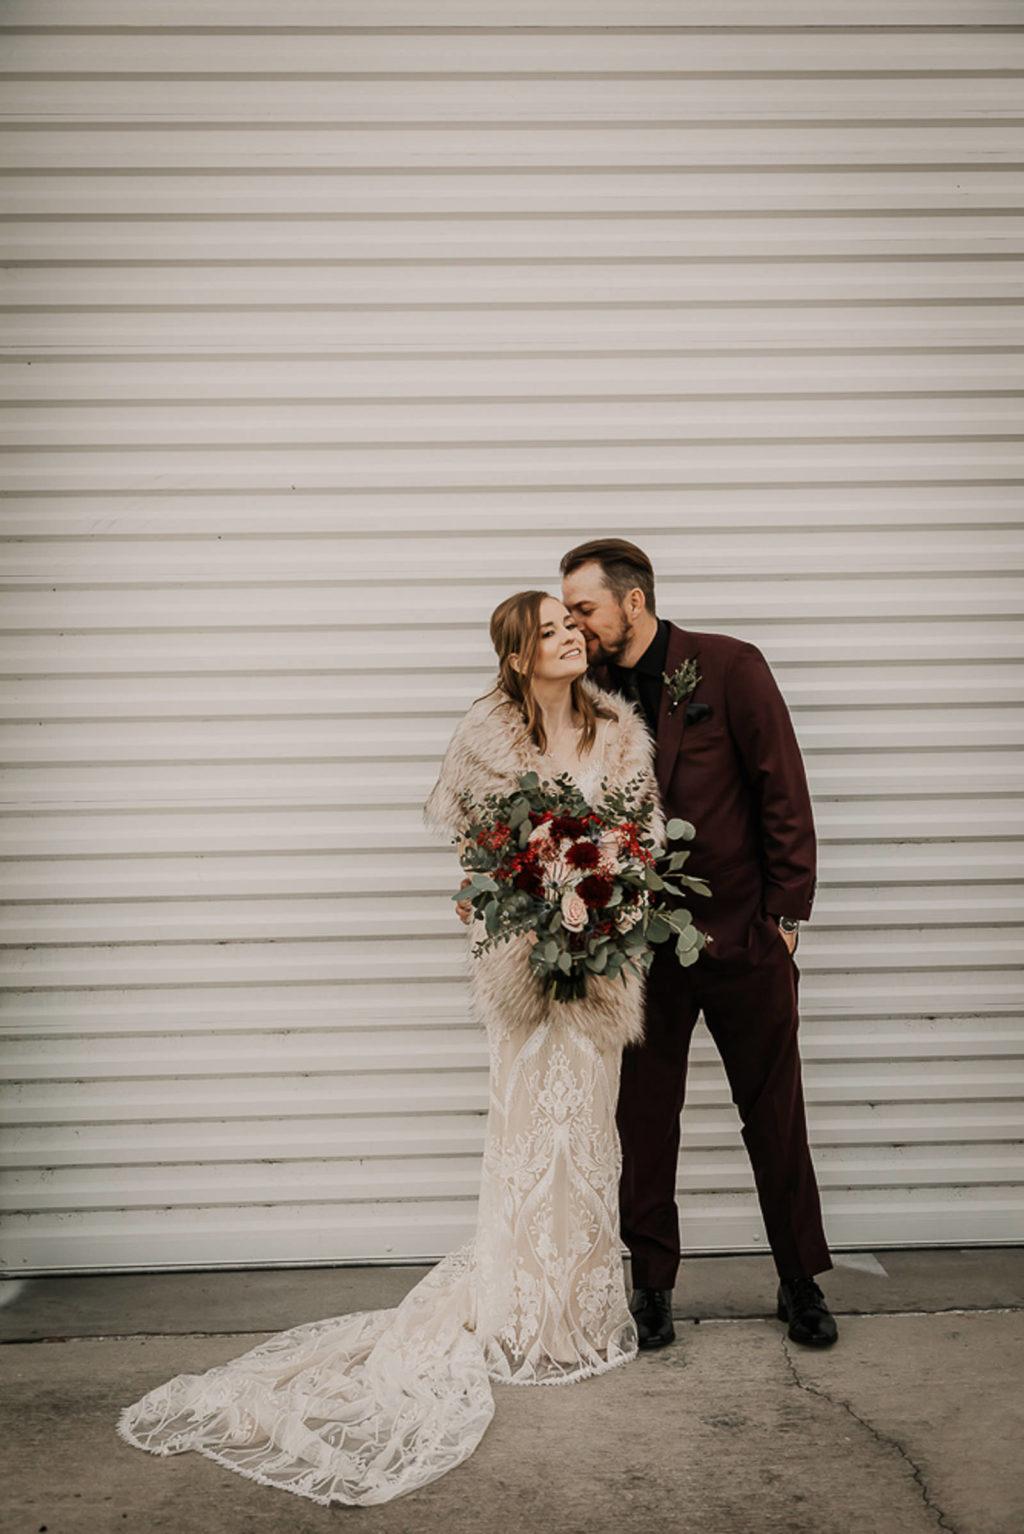 Bride and Groom Wedding Portrait | St. Pete Wedding Venue Urban Stillhouse